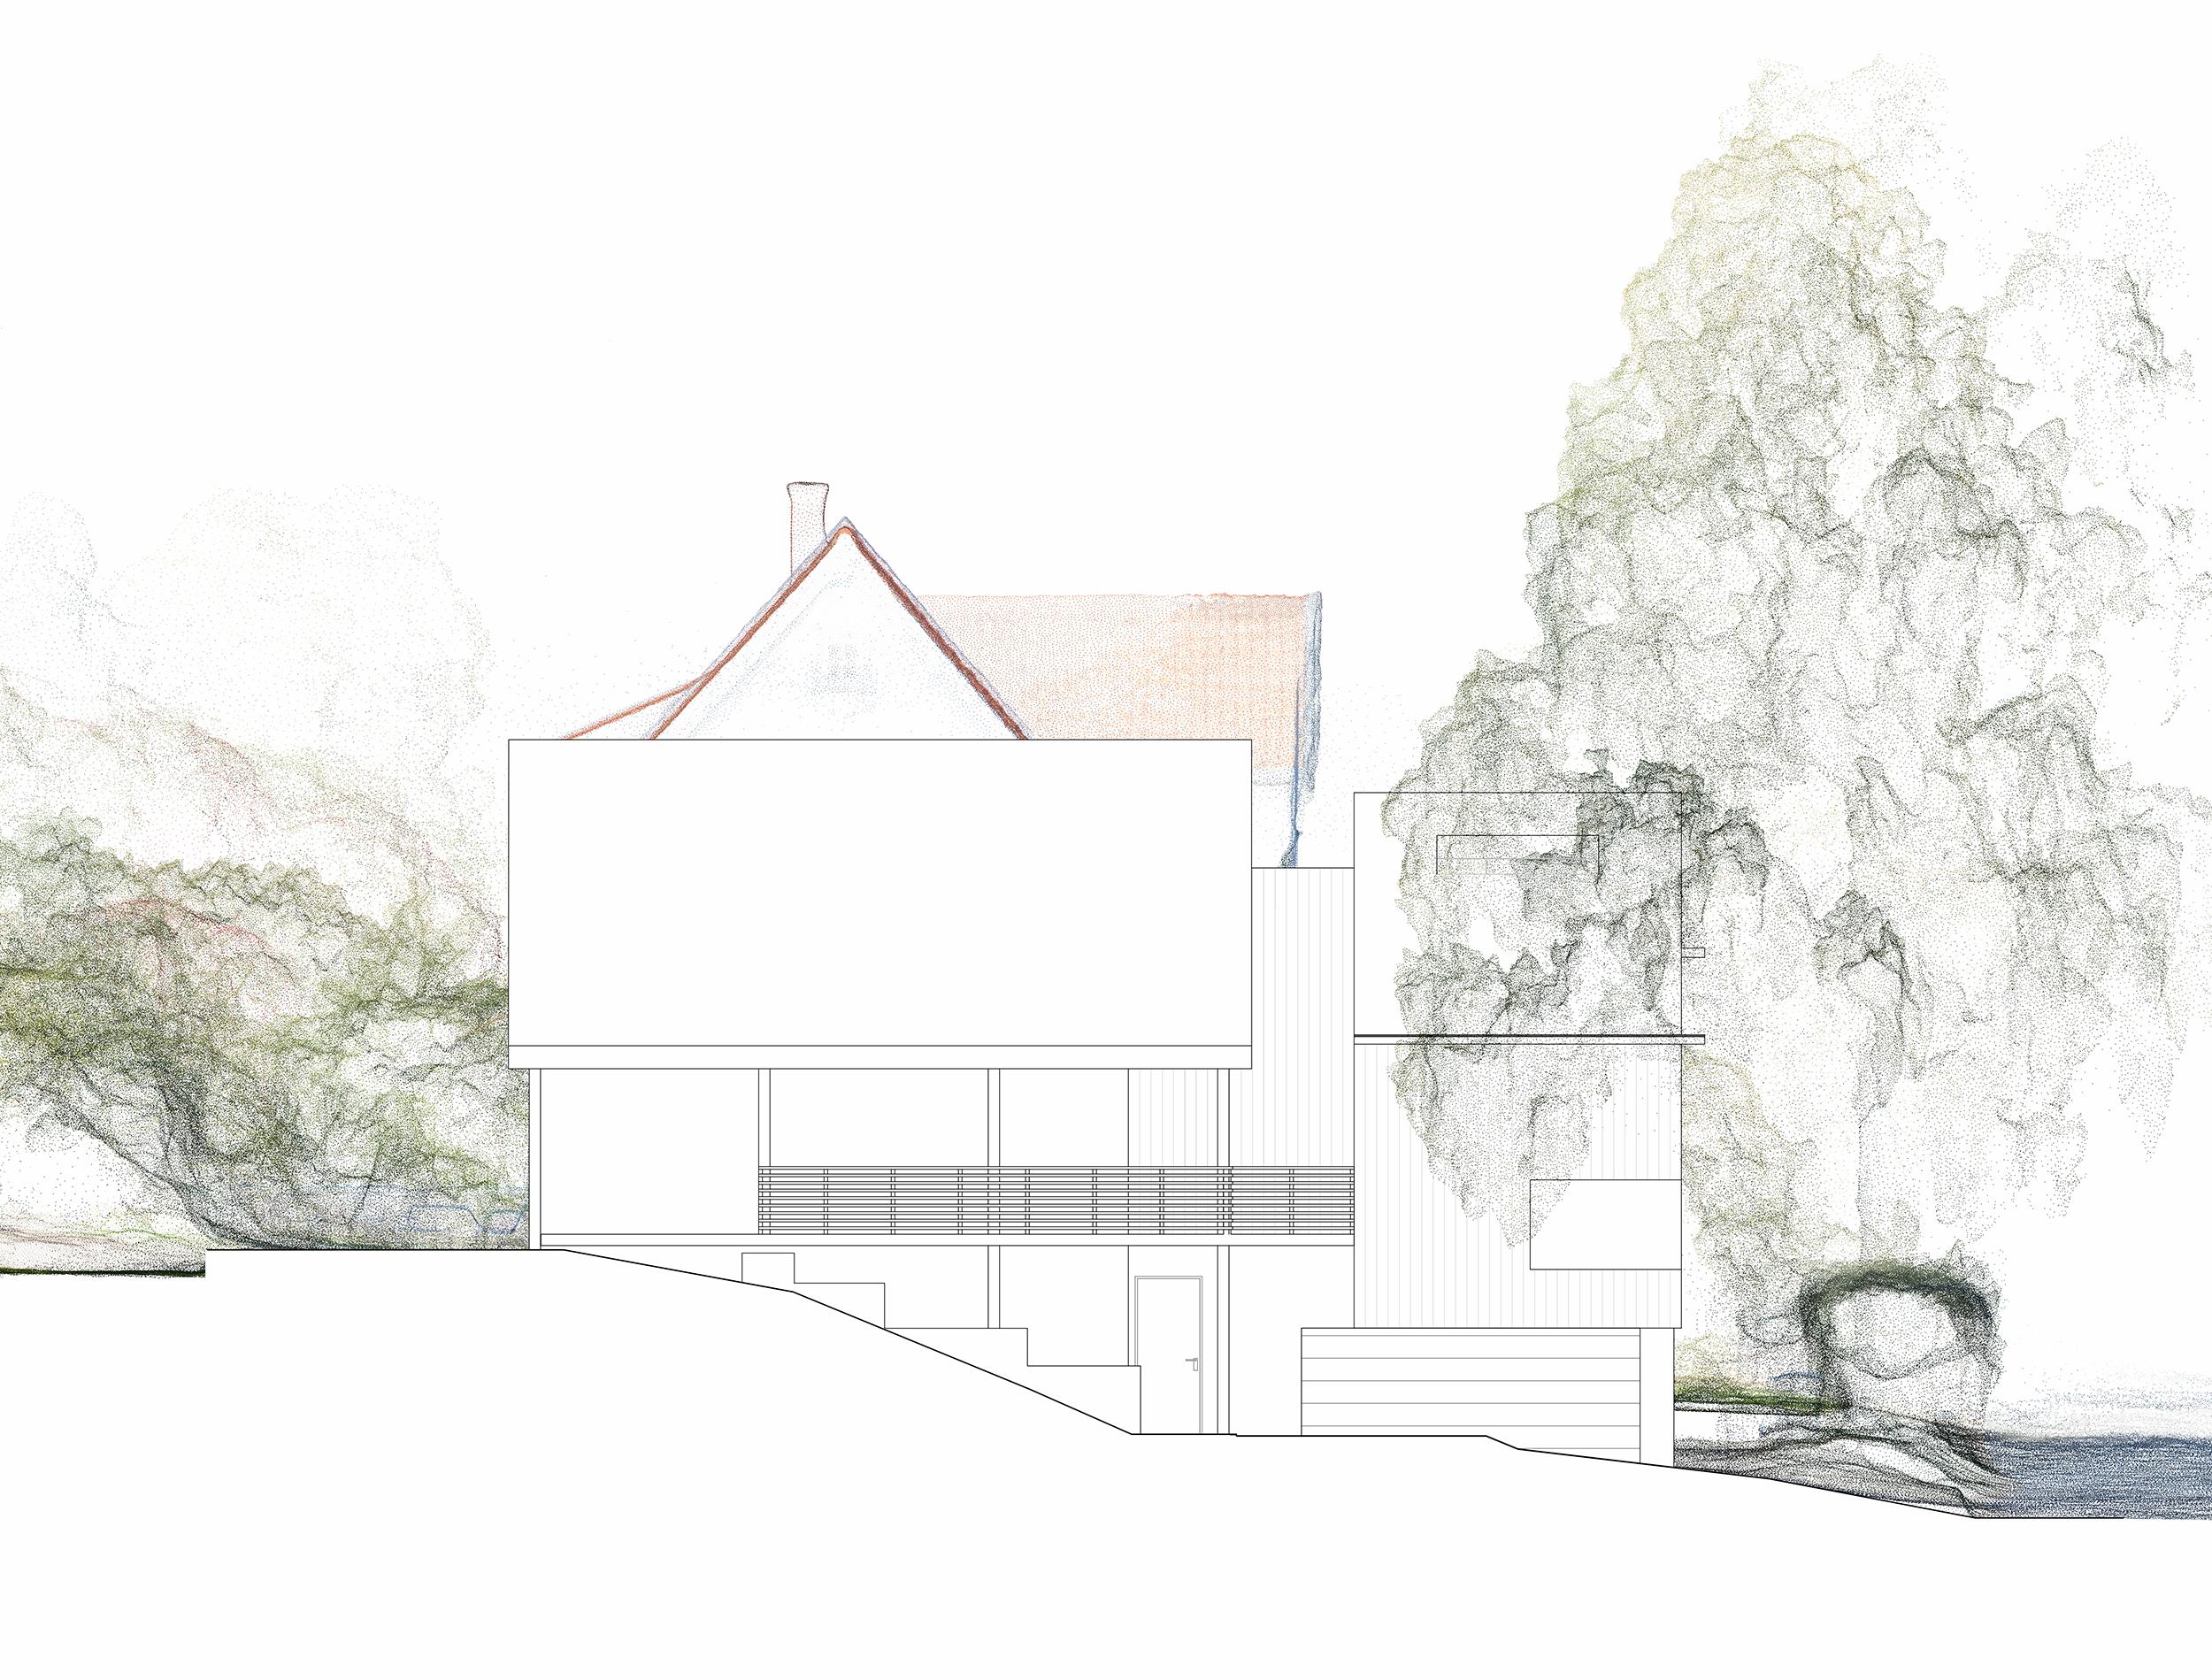 Forunderlig Arkitektur - 1603 - Fasade Sør